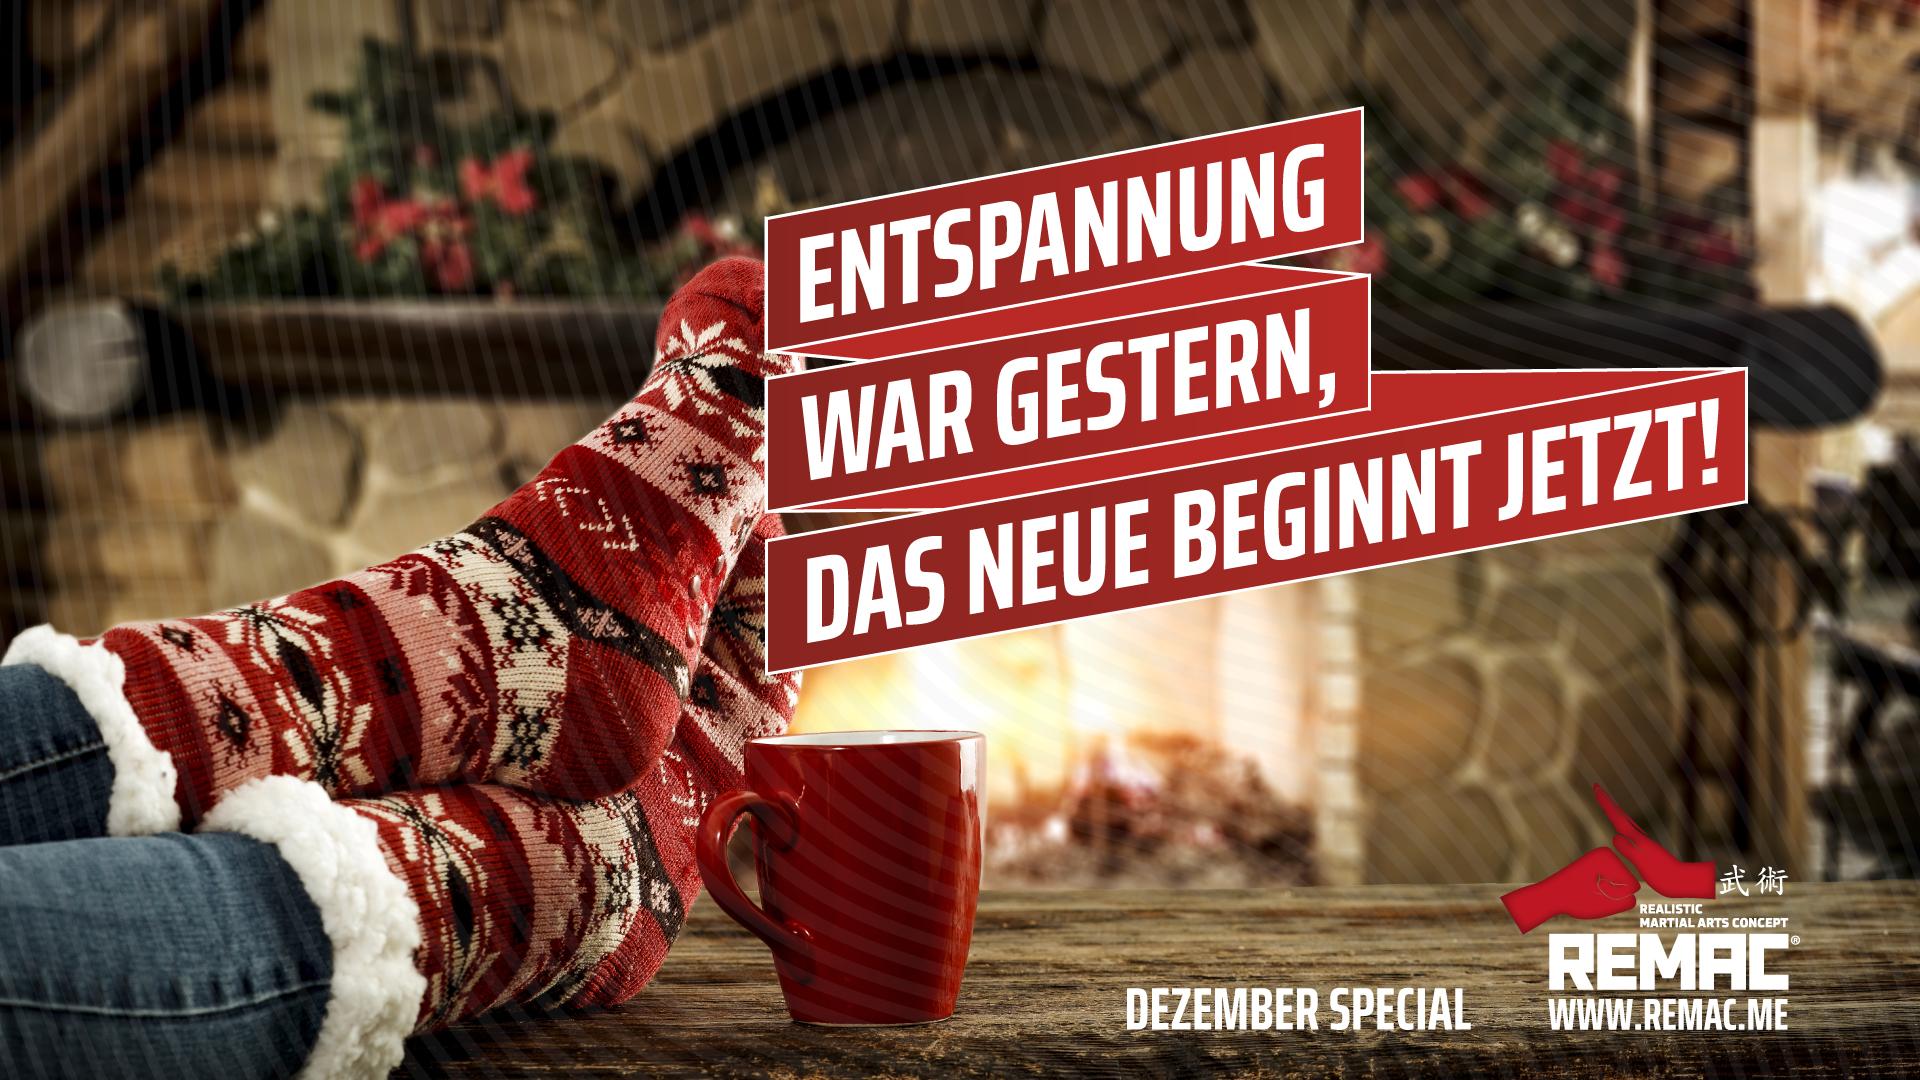 REMAC Dezember Special